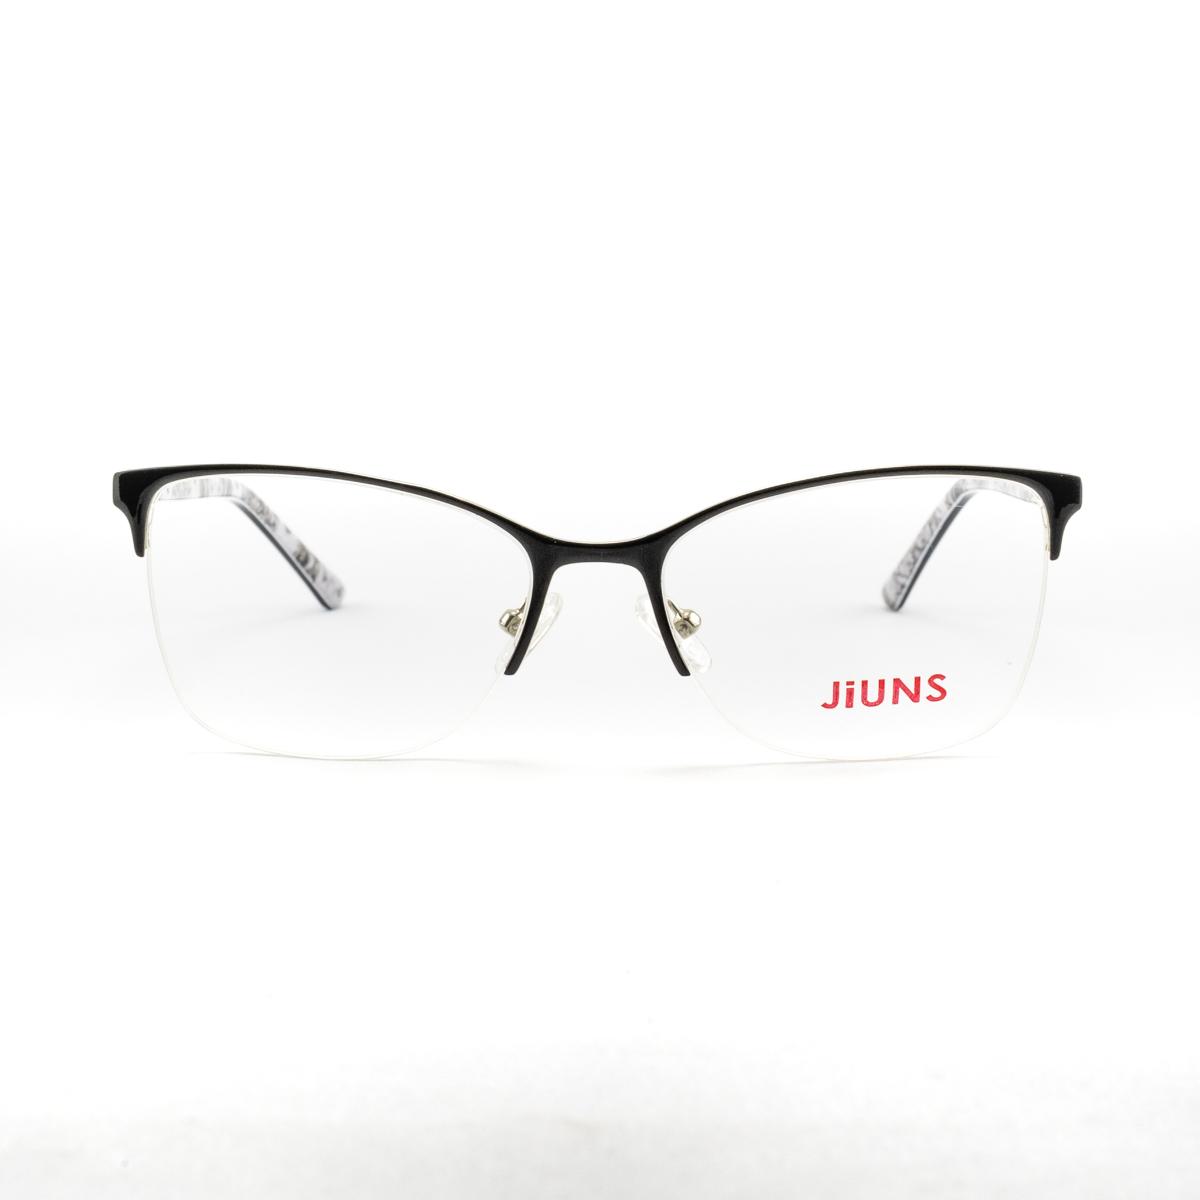 JiUNS MJ4334